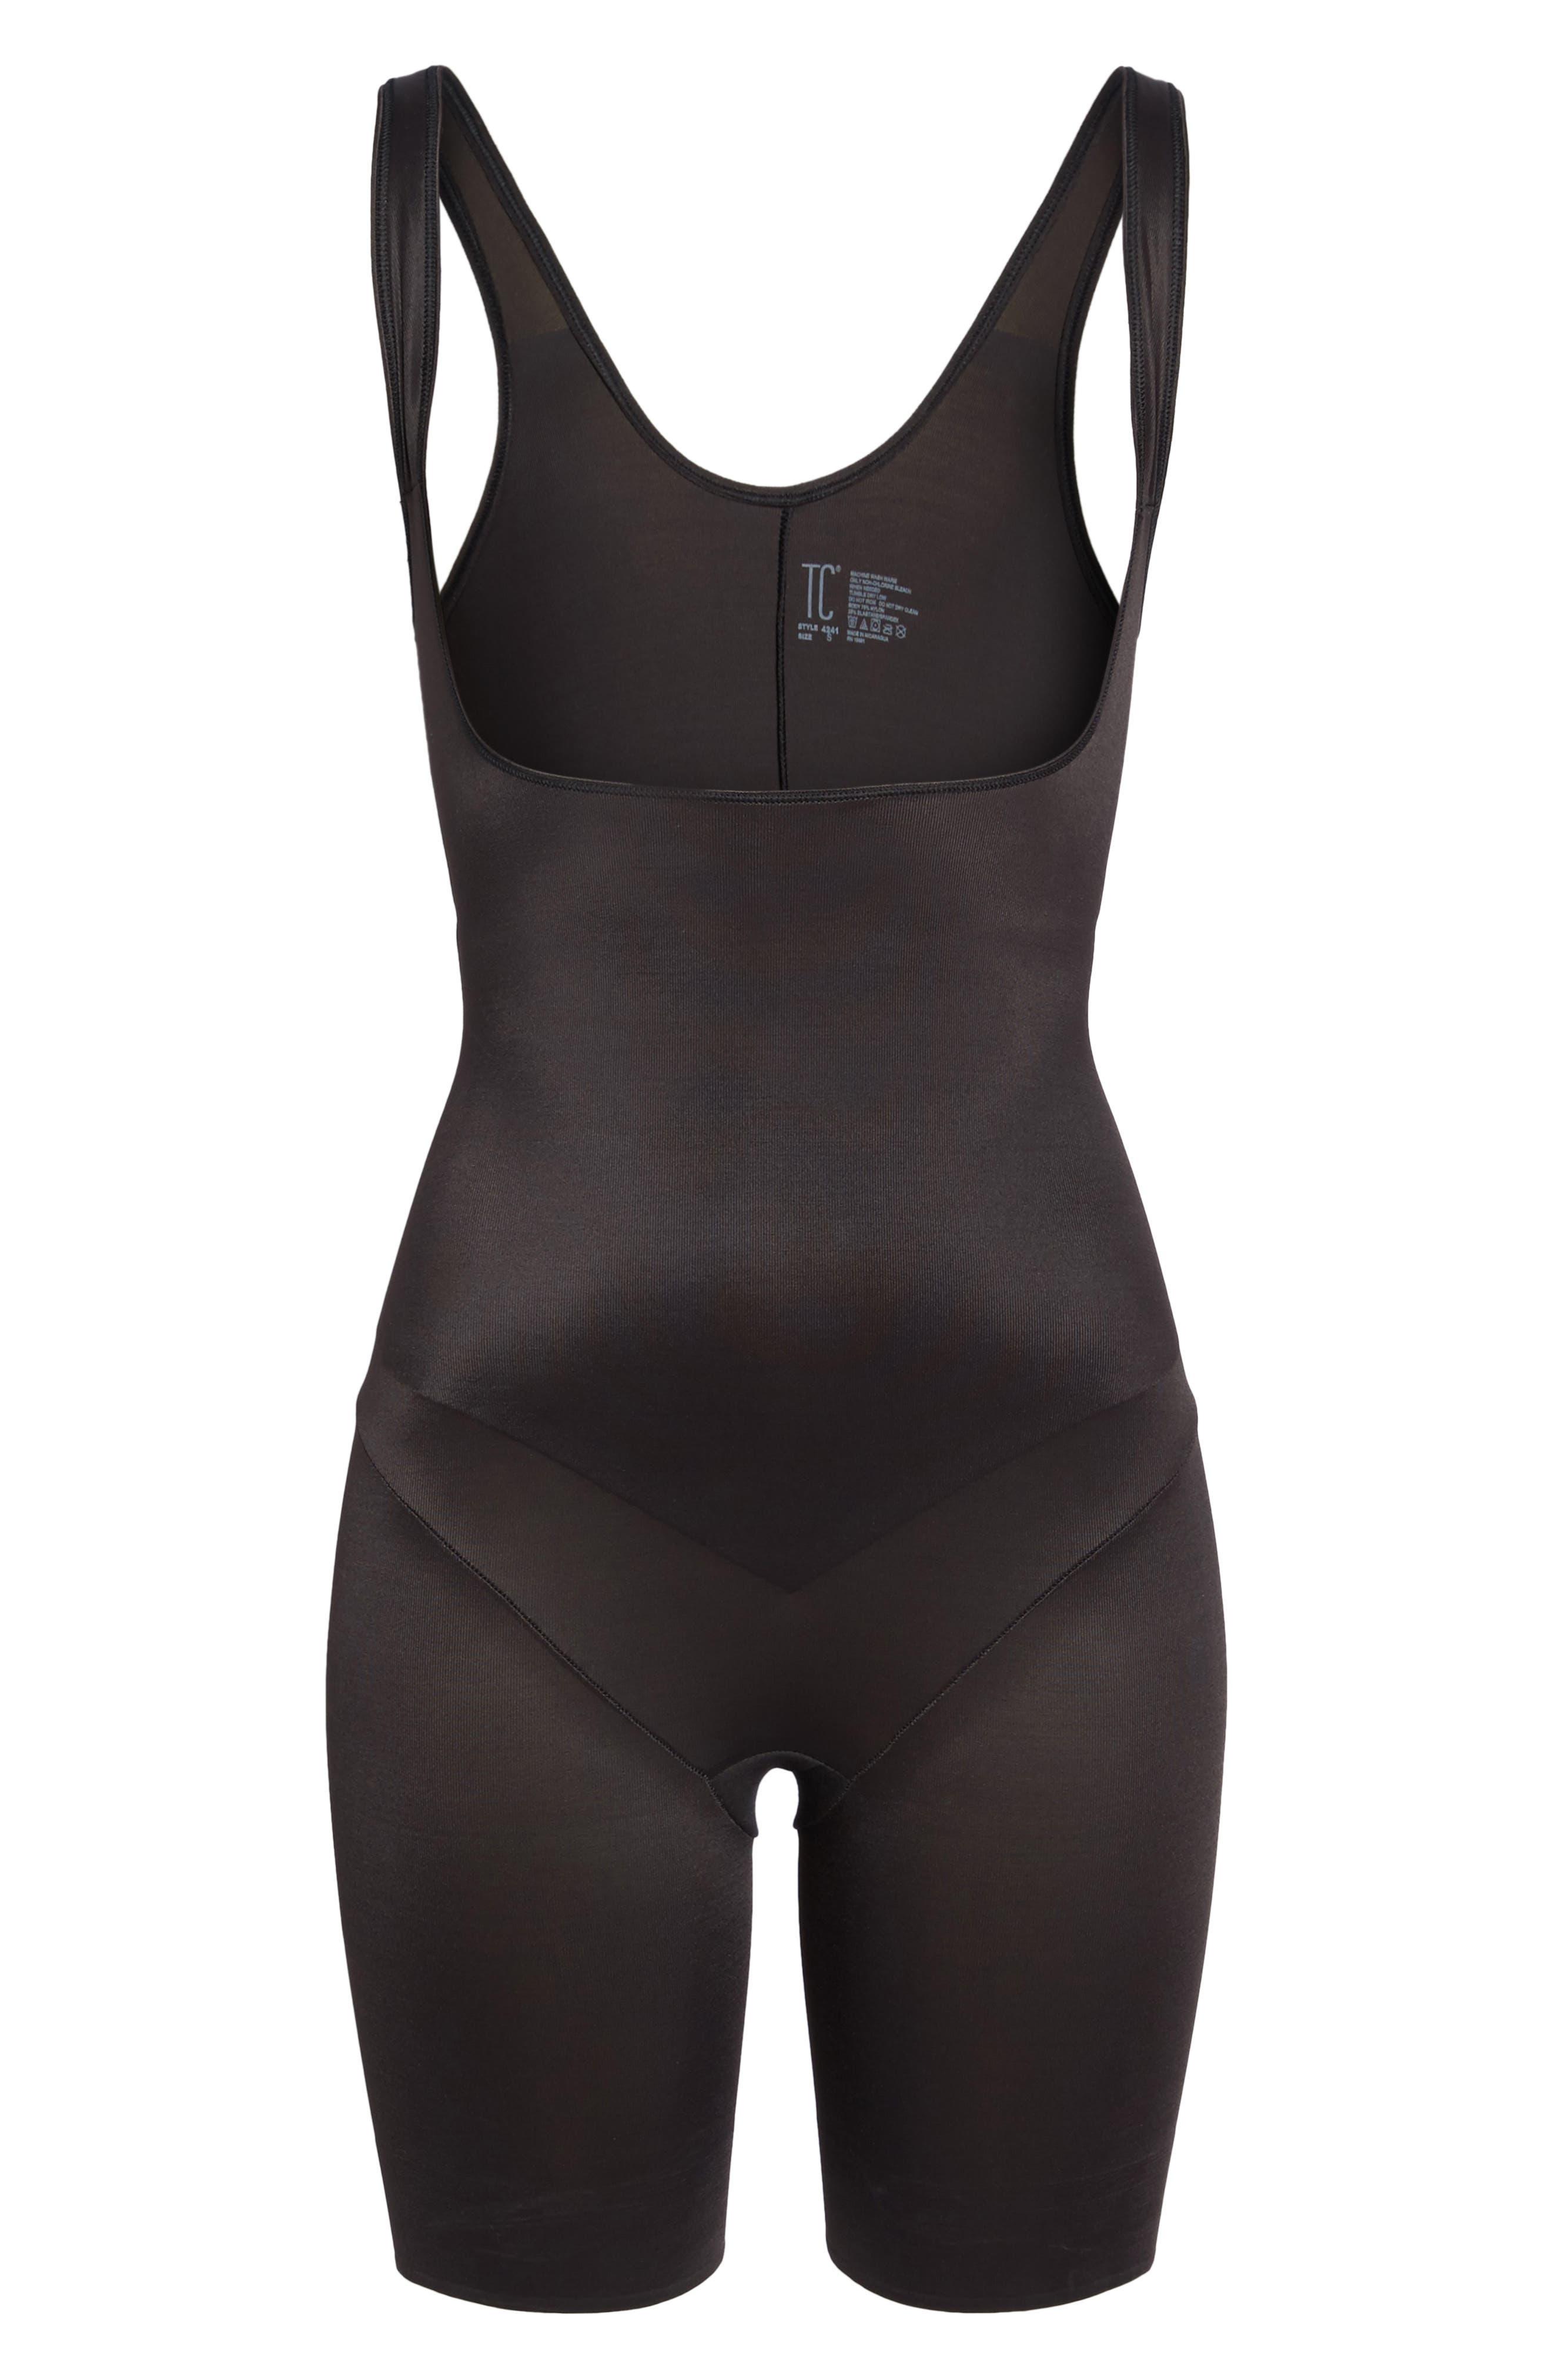 Torsette Underbust Mid Thigh Bodysuit Shaper,                             Alternate thumbnail 7, color,                             BLACK